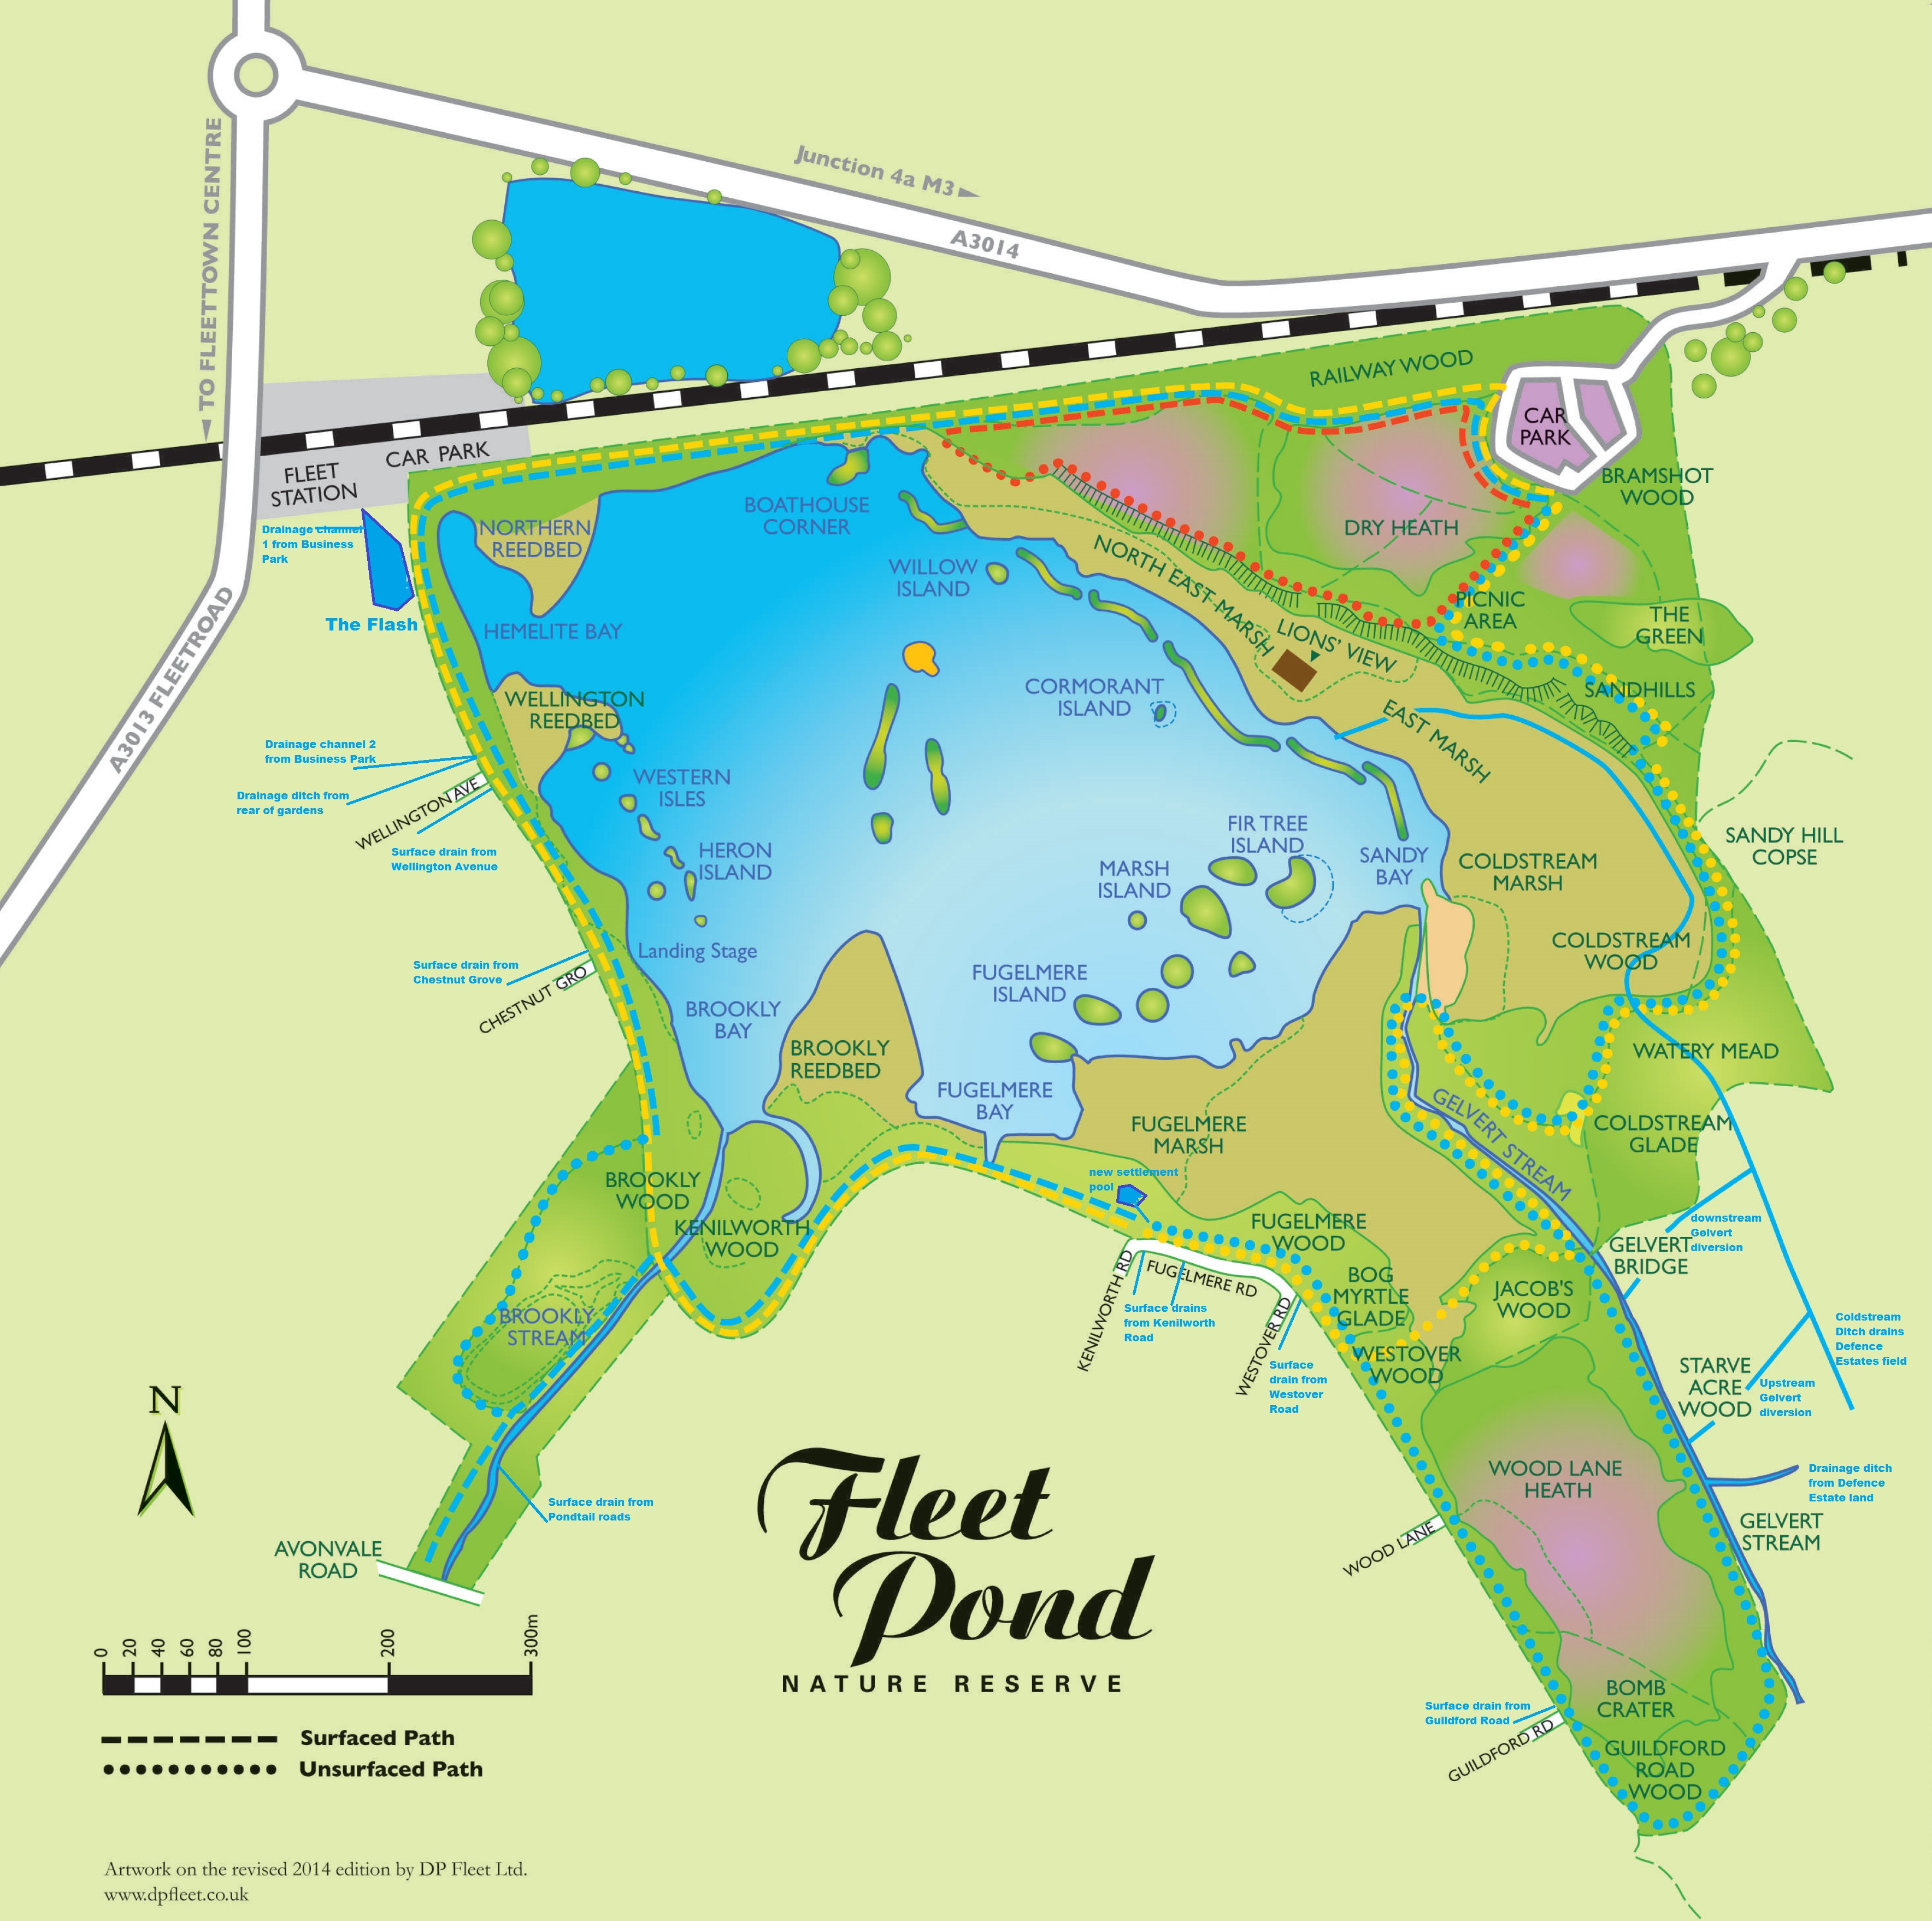 fleet-pond-drainage-routes